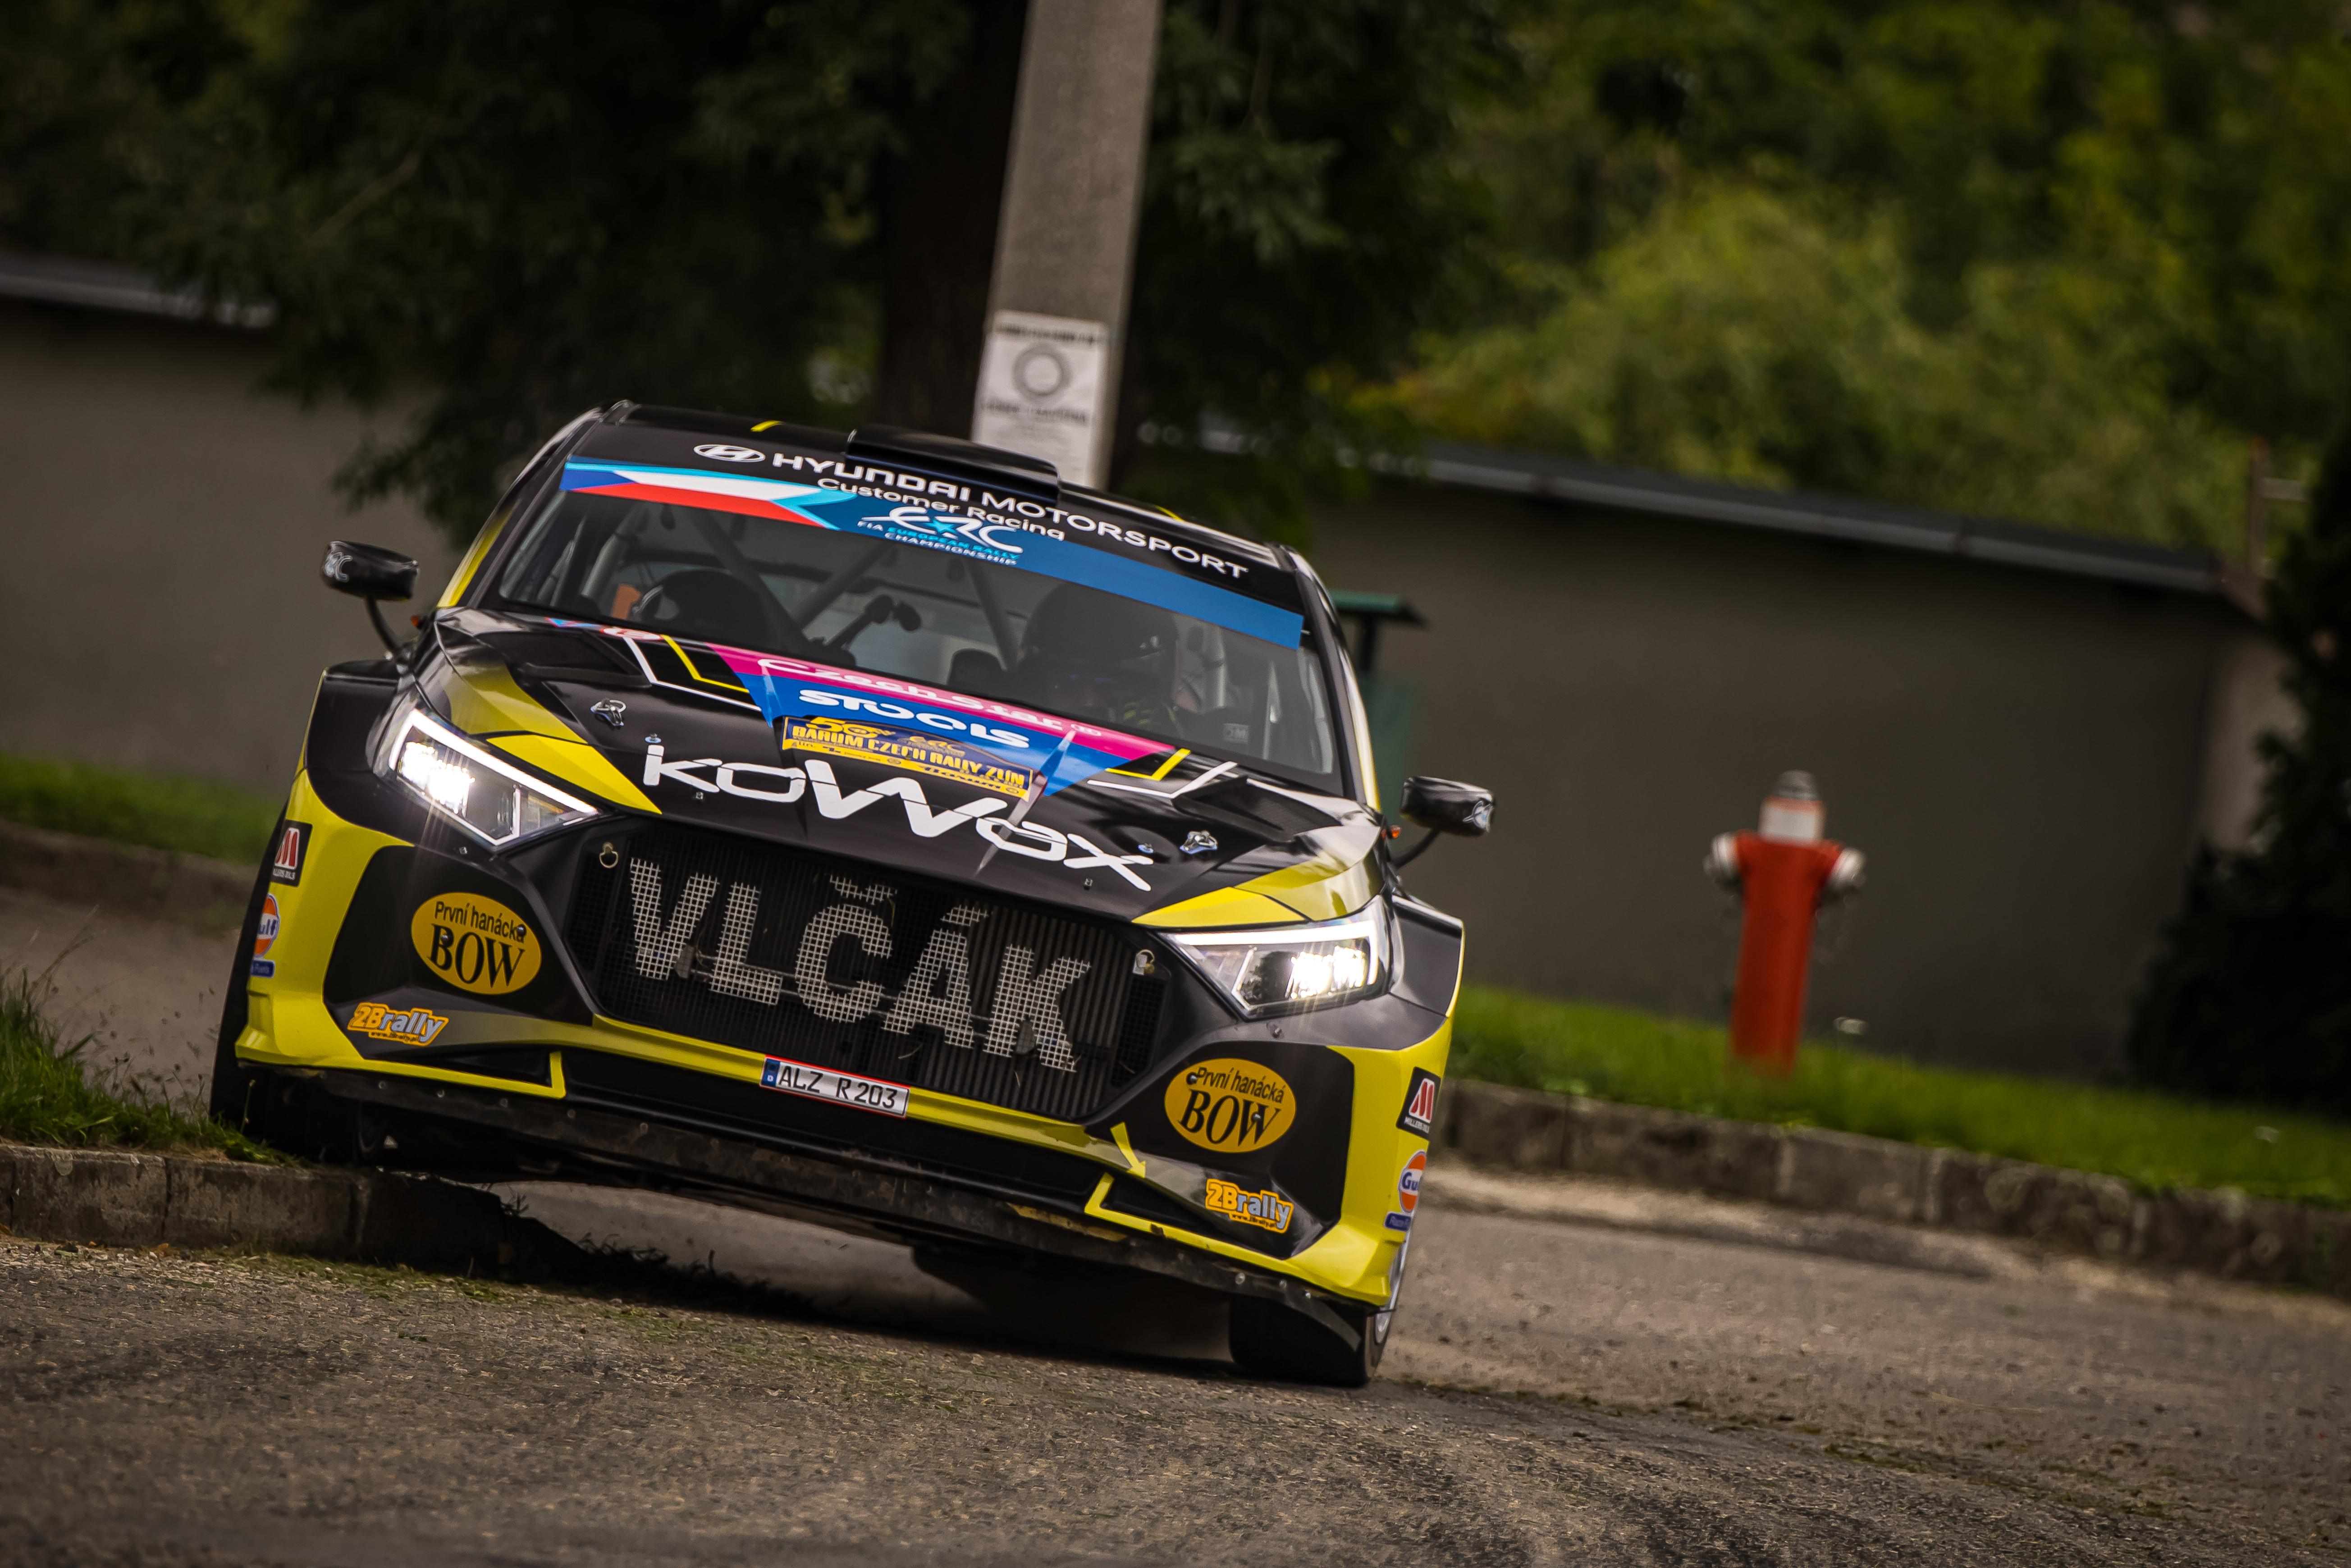 Martin Vlcek - i20 N Rally2